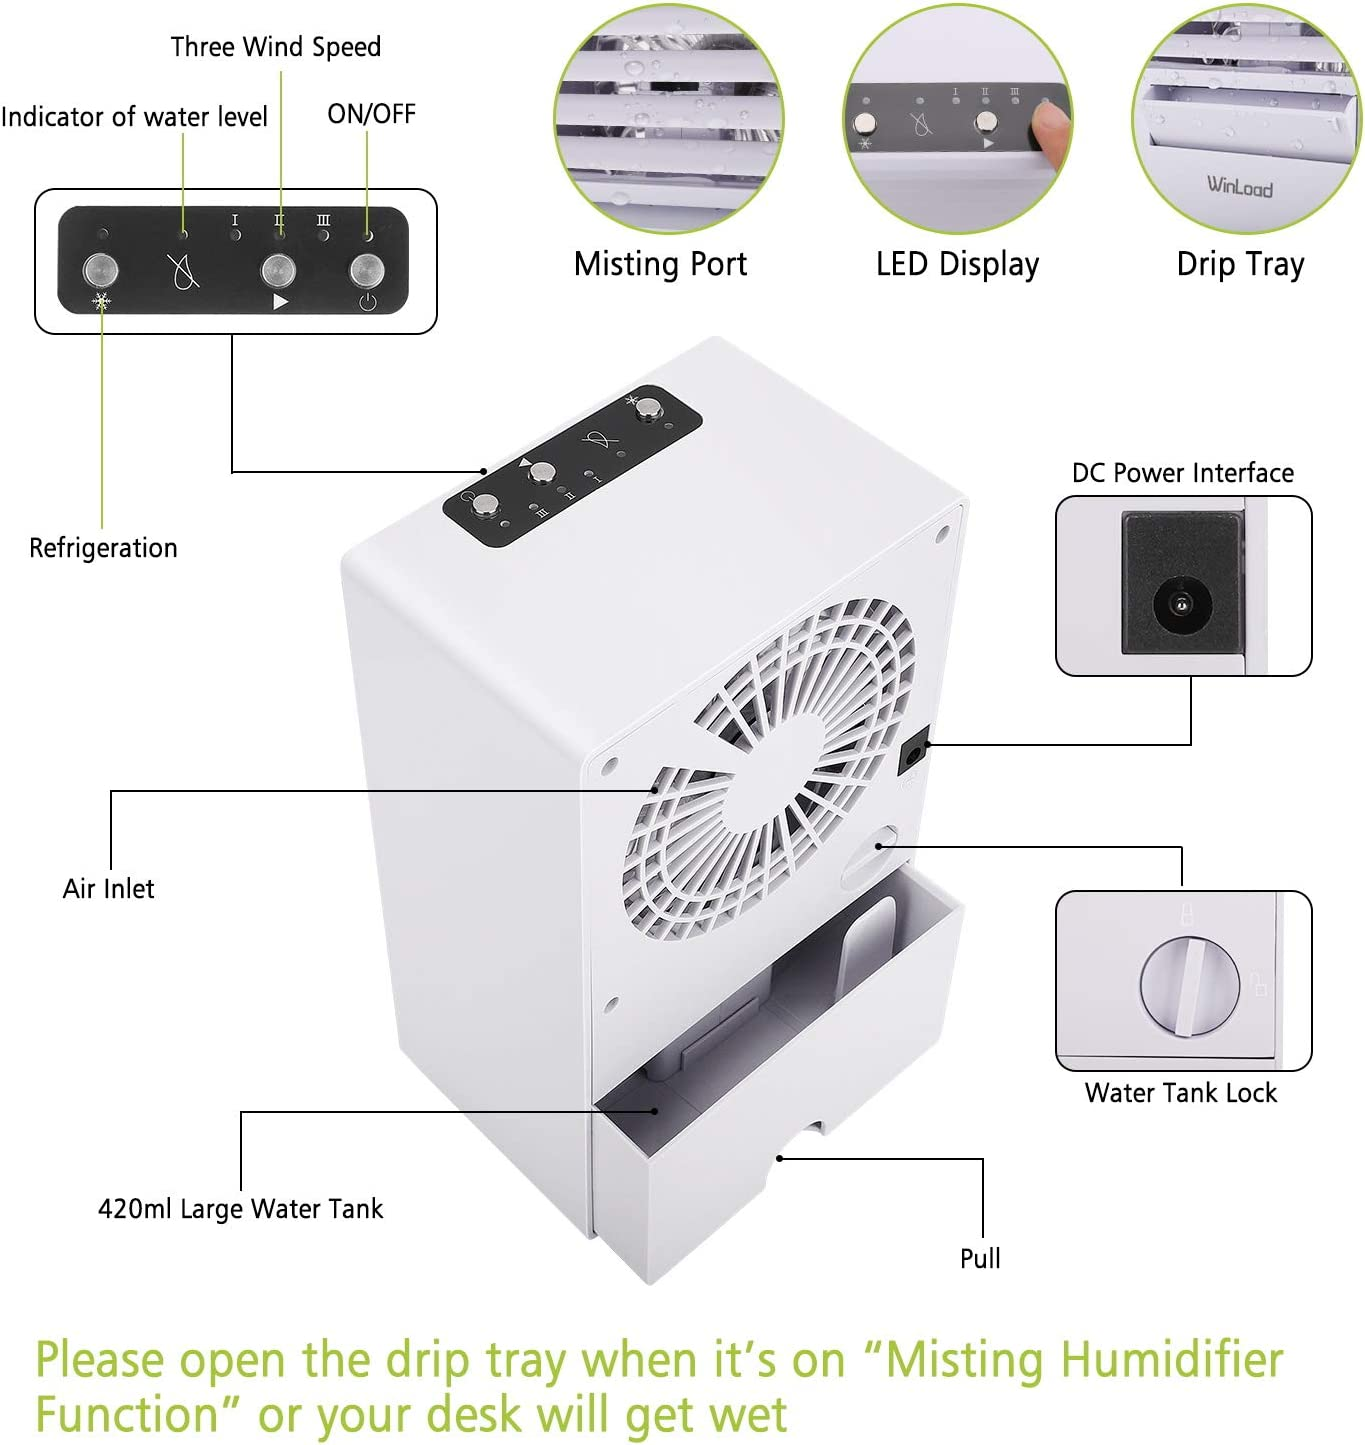 Espacio Personal Enfriador de Aire Humidificador Purificador Climatizador Evaporativo Mini para Casa y Oficina 3 Velocidades Winload 3 En 1 Enfriador Aire Portatil Aire Acondicionado M/óvil